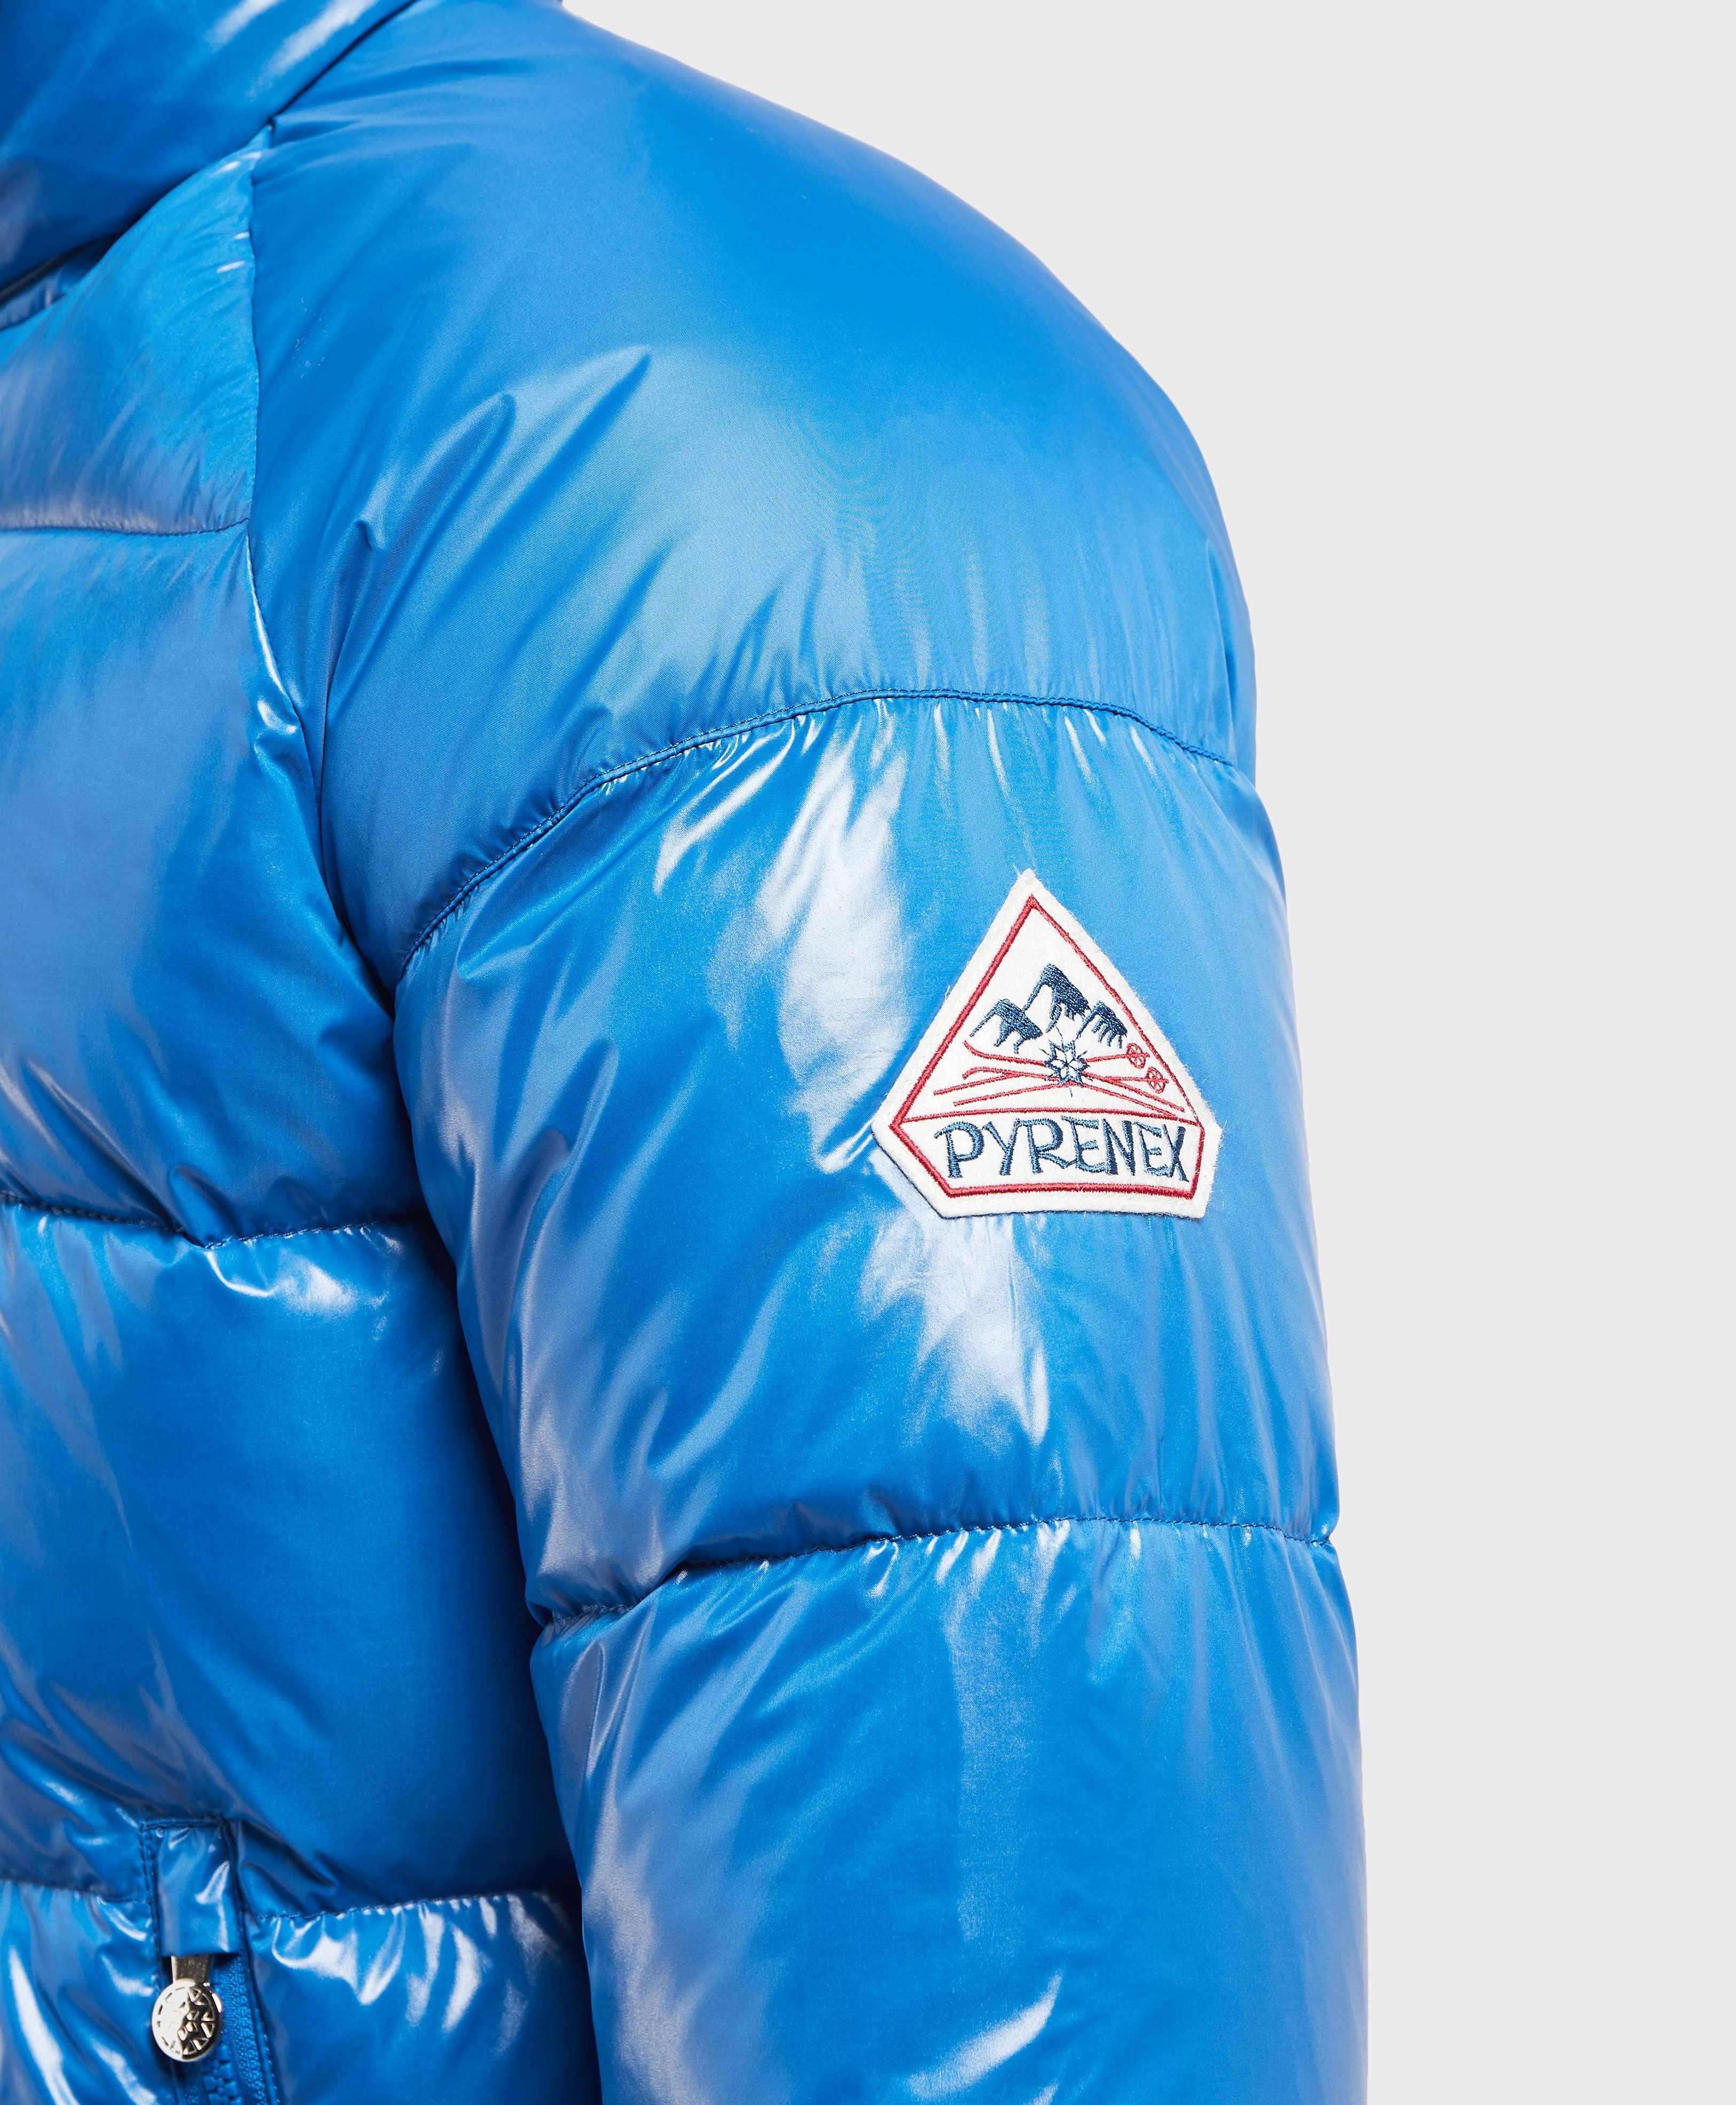 Pyrenex Vintage Mythic Shiny Down Jacket